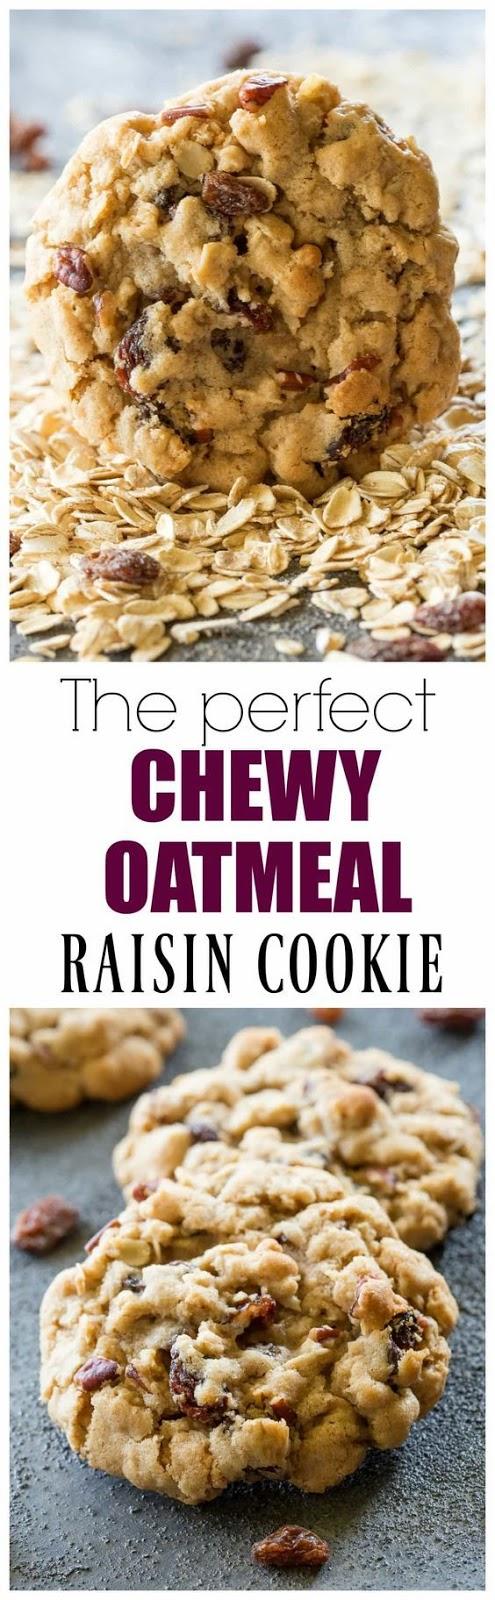 Chewy Oatmeal Raisin Cookie